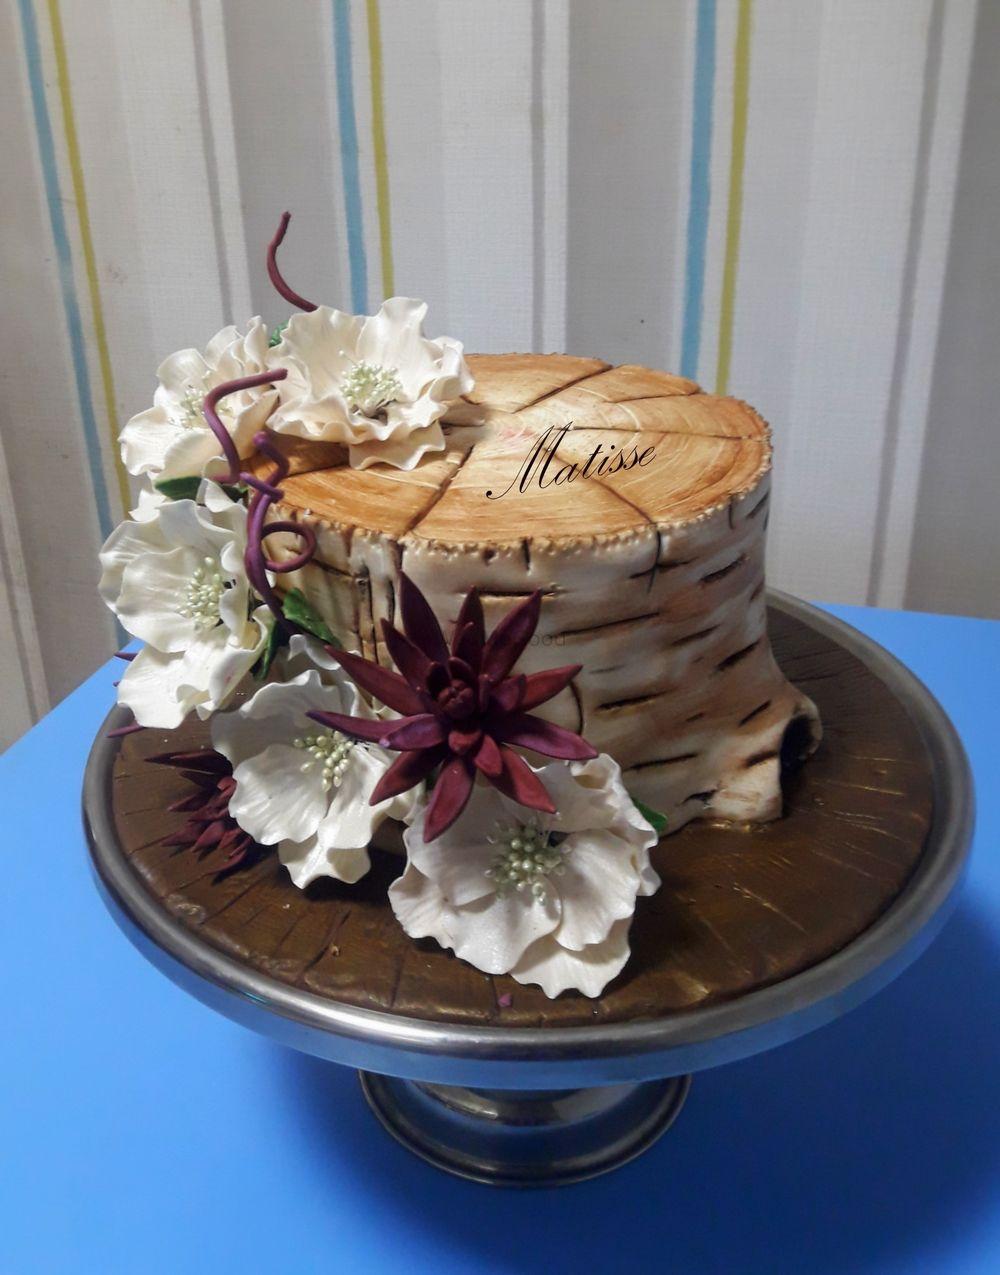 Photo From custom cakes - By Matisse Cake Design Studio